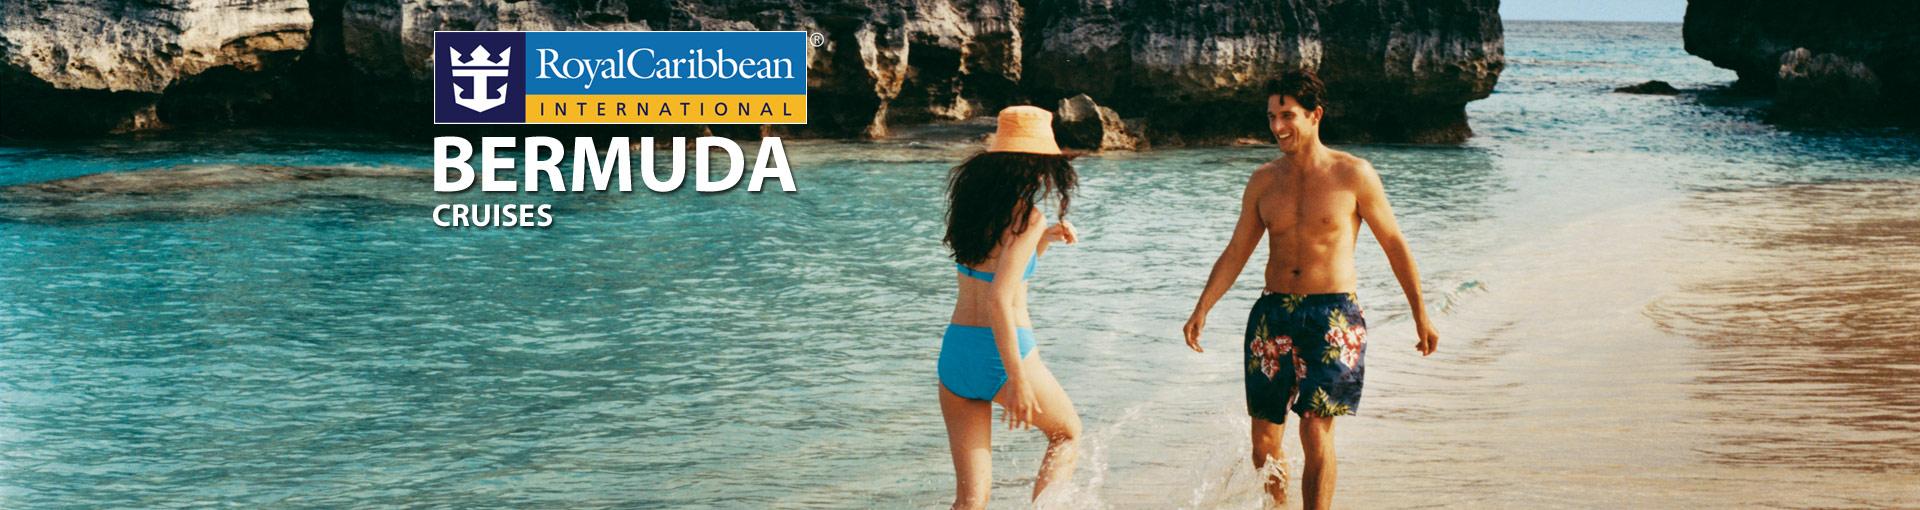 Royal Caribbean Bermuda Cruises